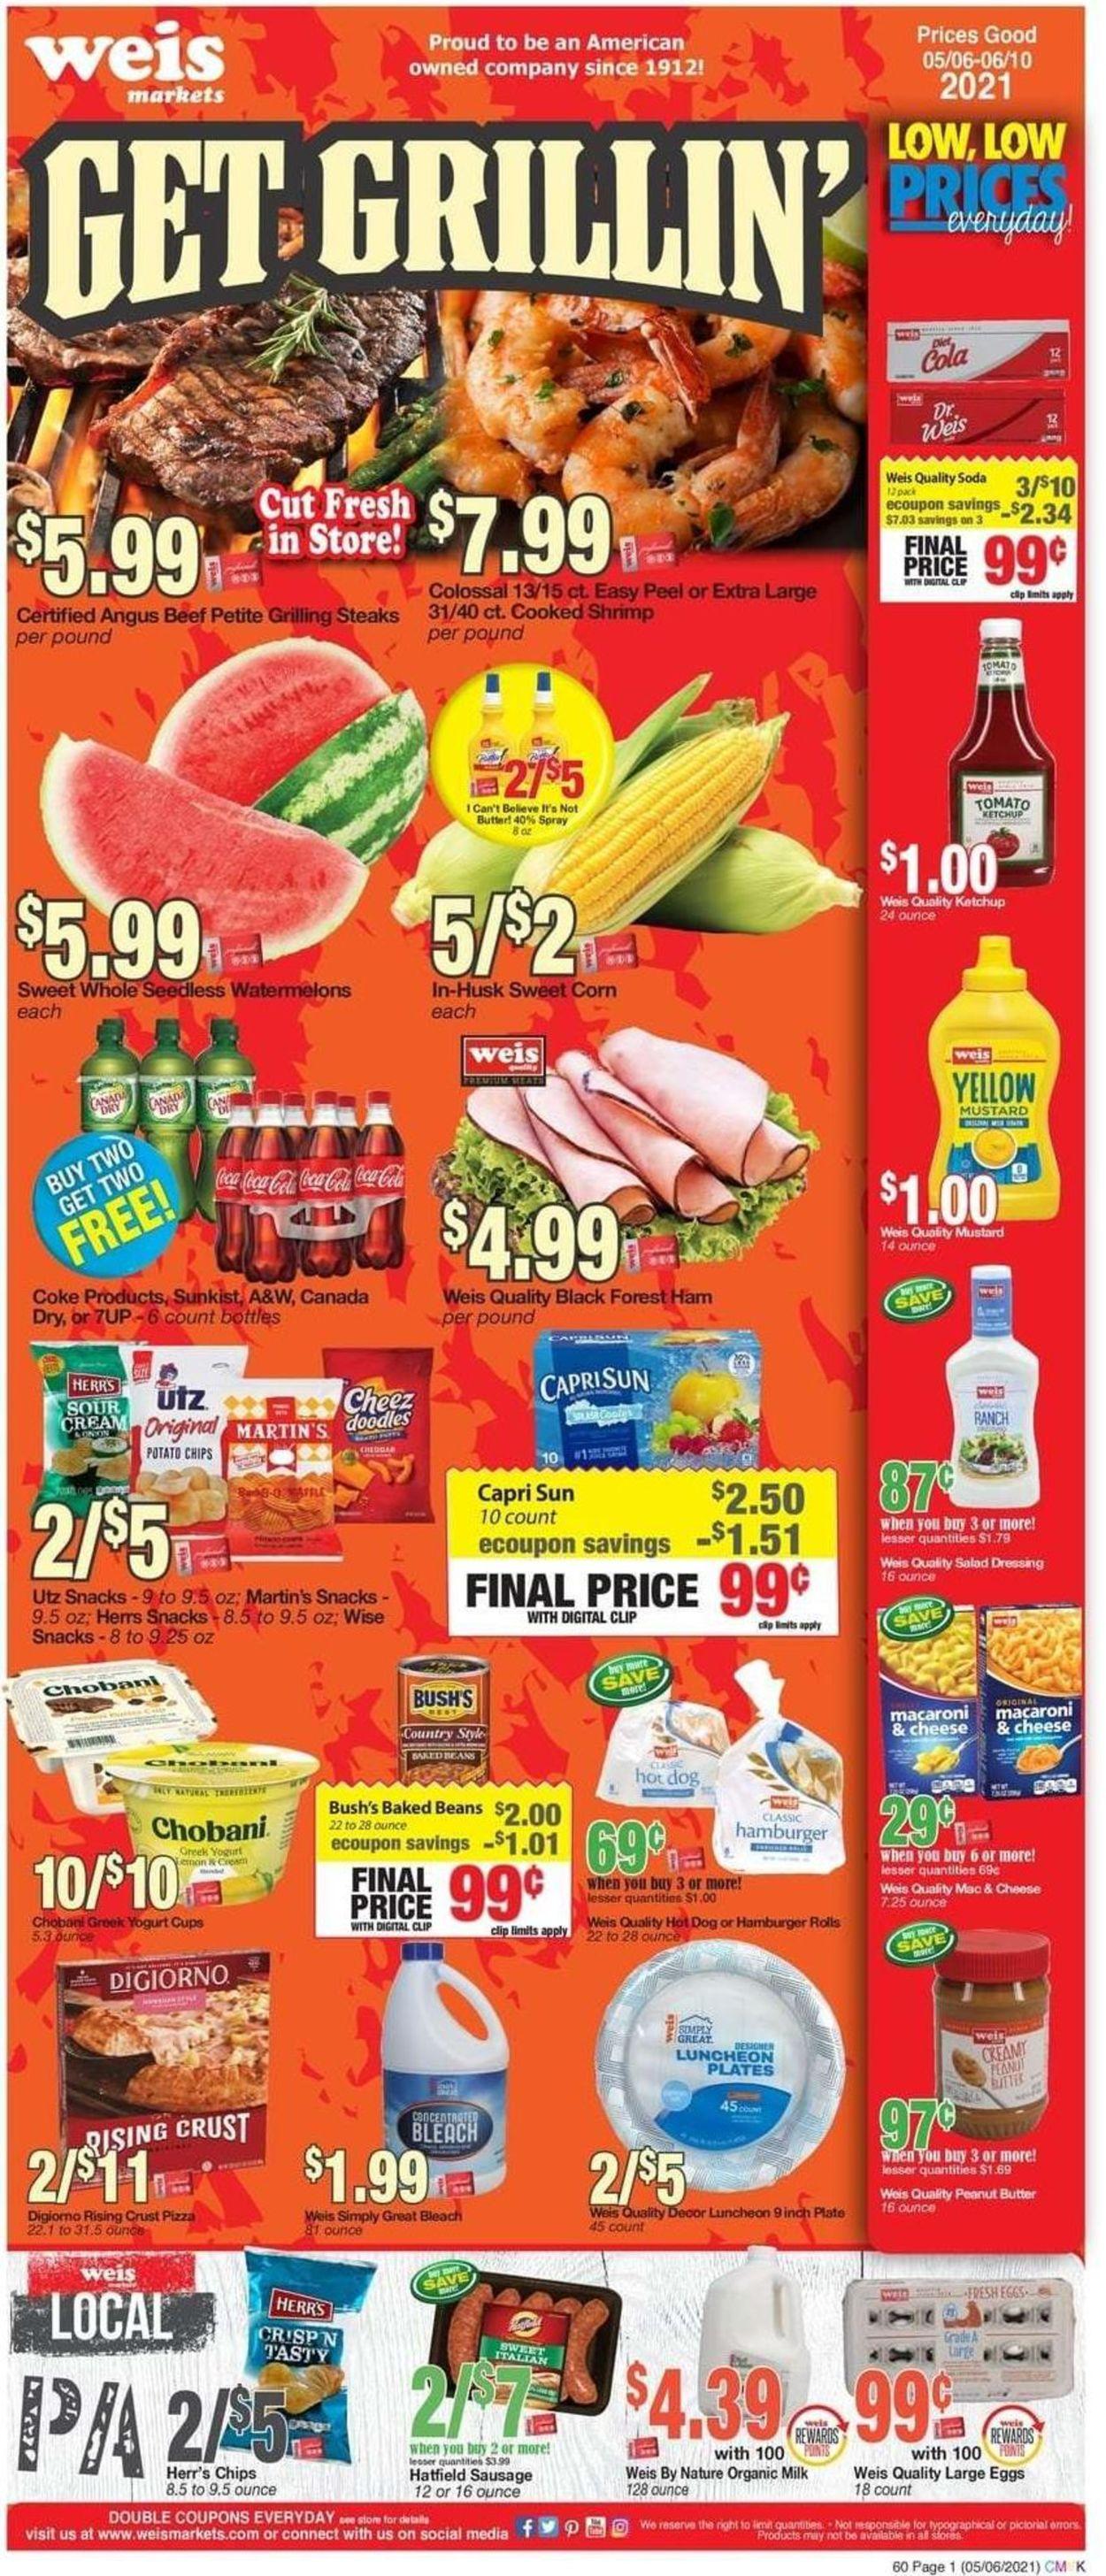 Weis Weekly Ad Circular - valid 05/06-06/10/2021